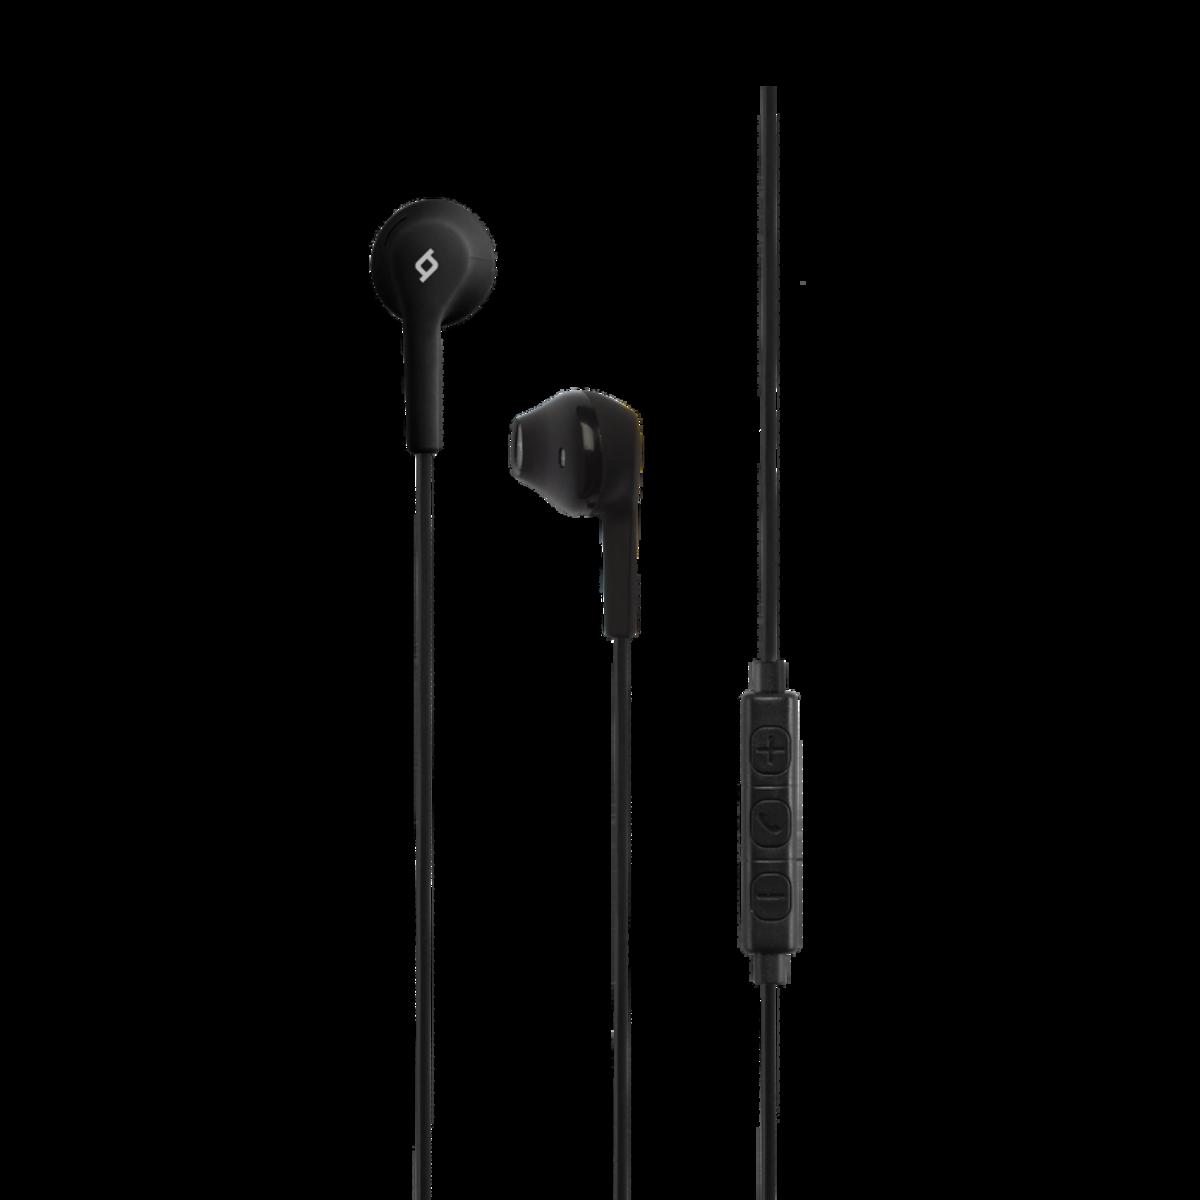 Слушалки RIO In-Ear Headphones with Built-in remote control - Черни, 117951